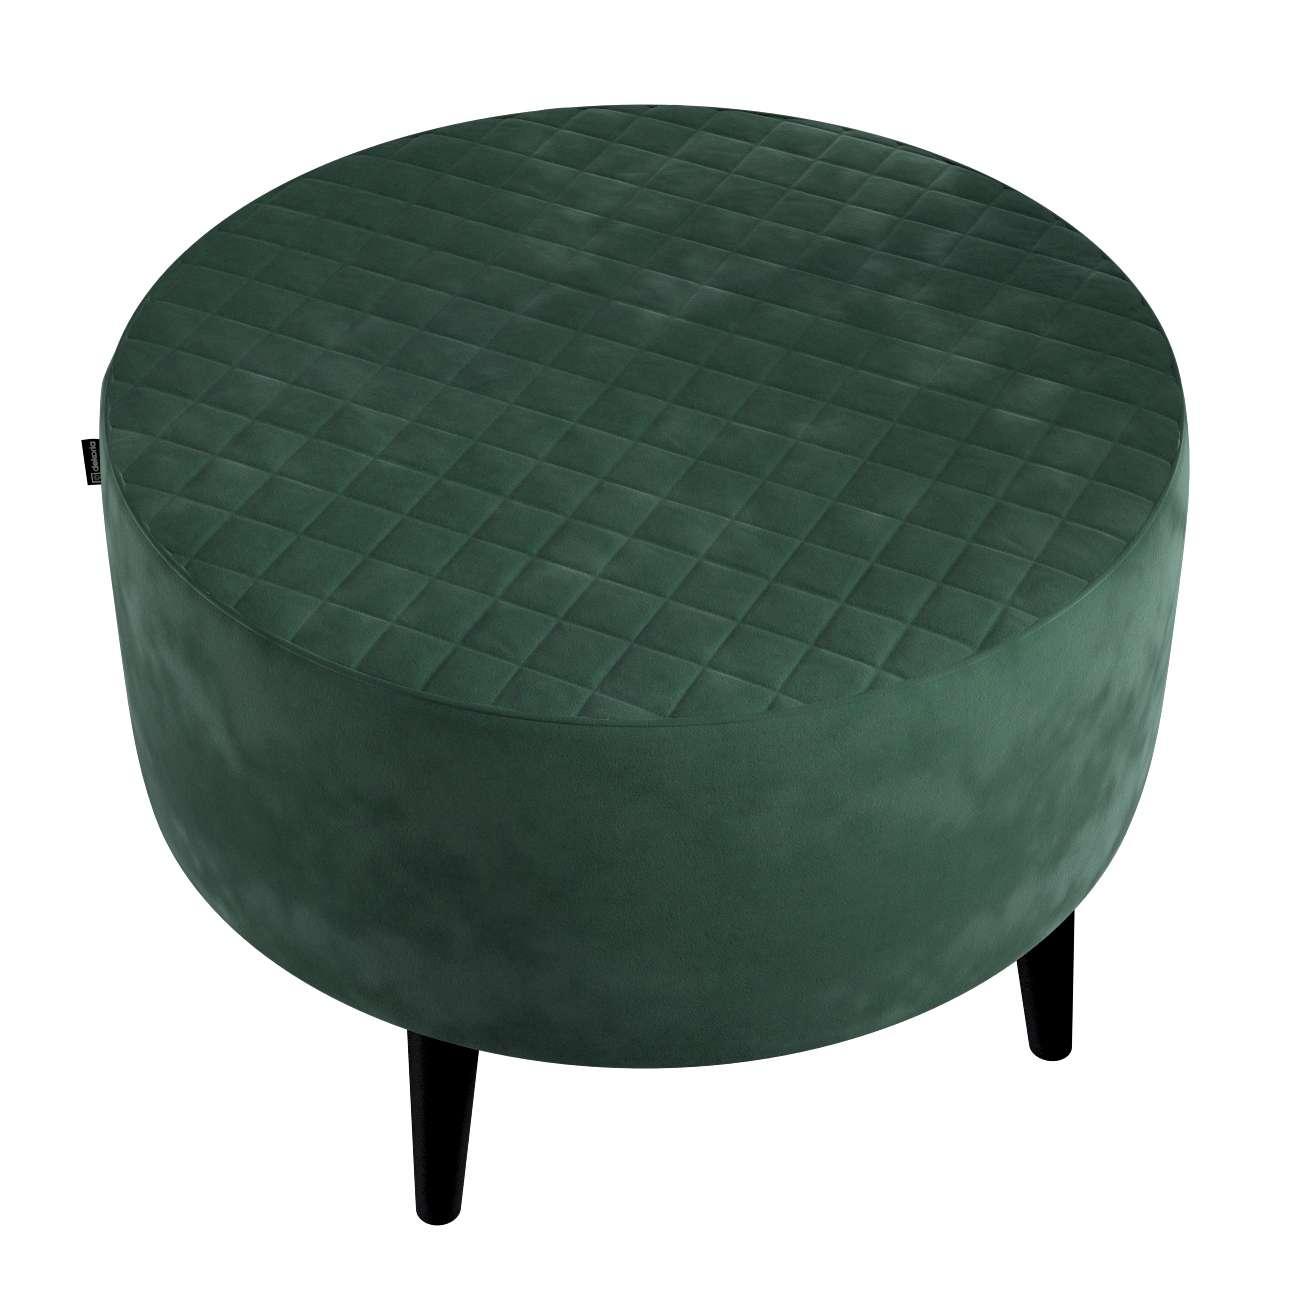 Podnóżek okrągły pikowany w kolekcji Velvet, tkanina: 704-25